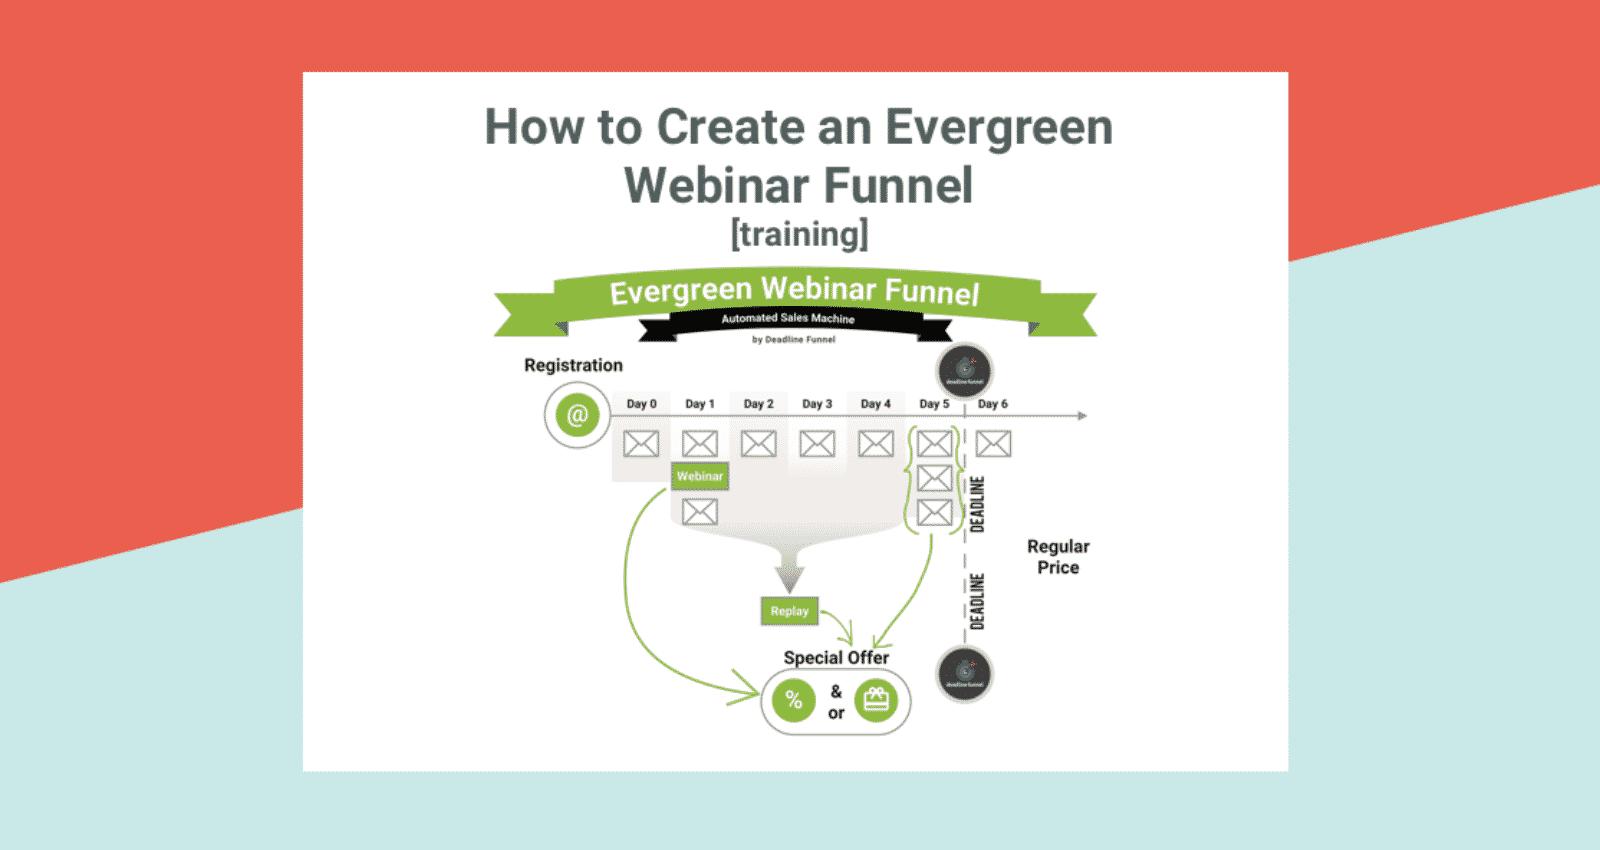 Evergreen Webinar Funnel